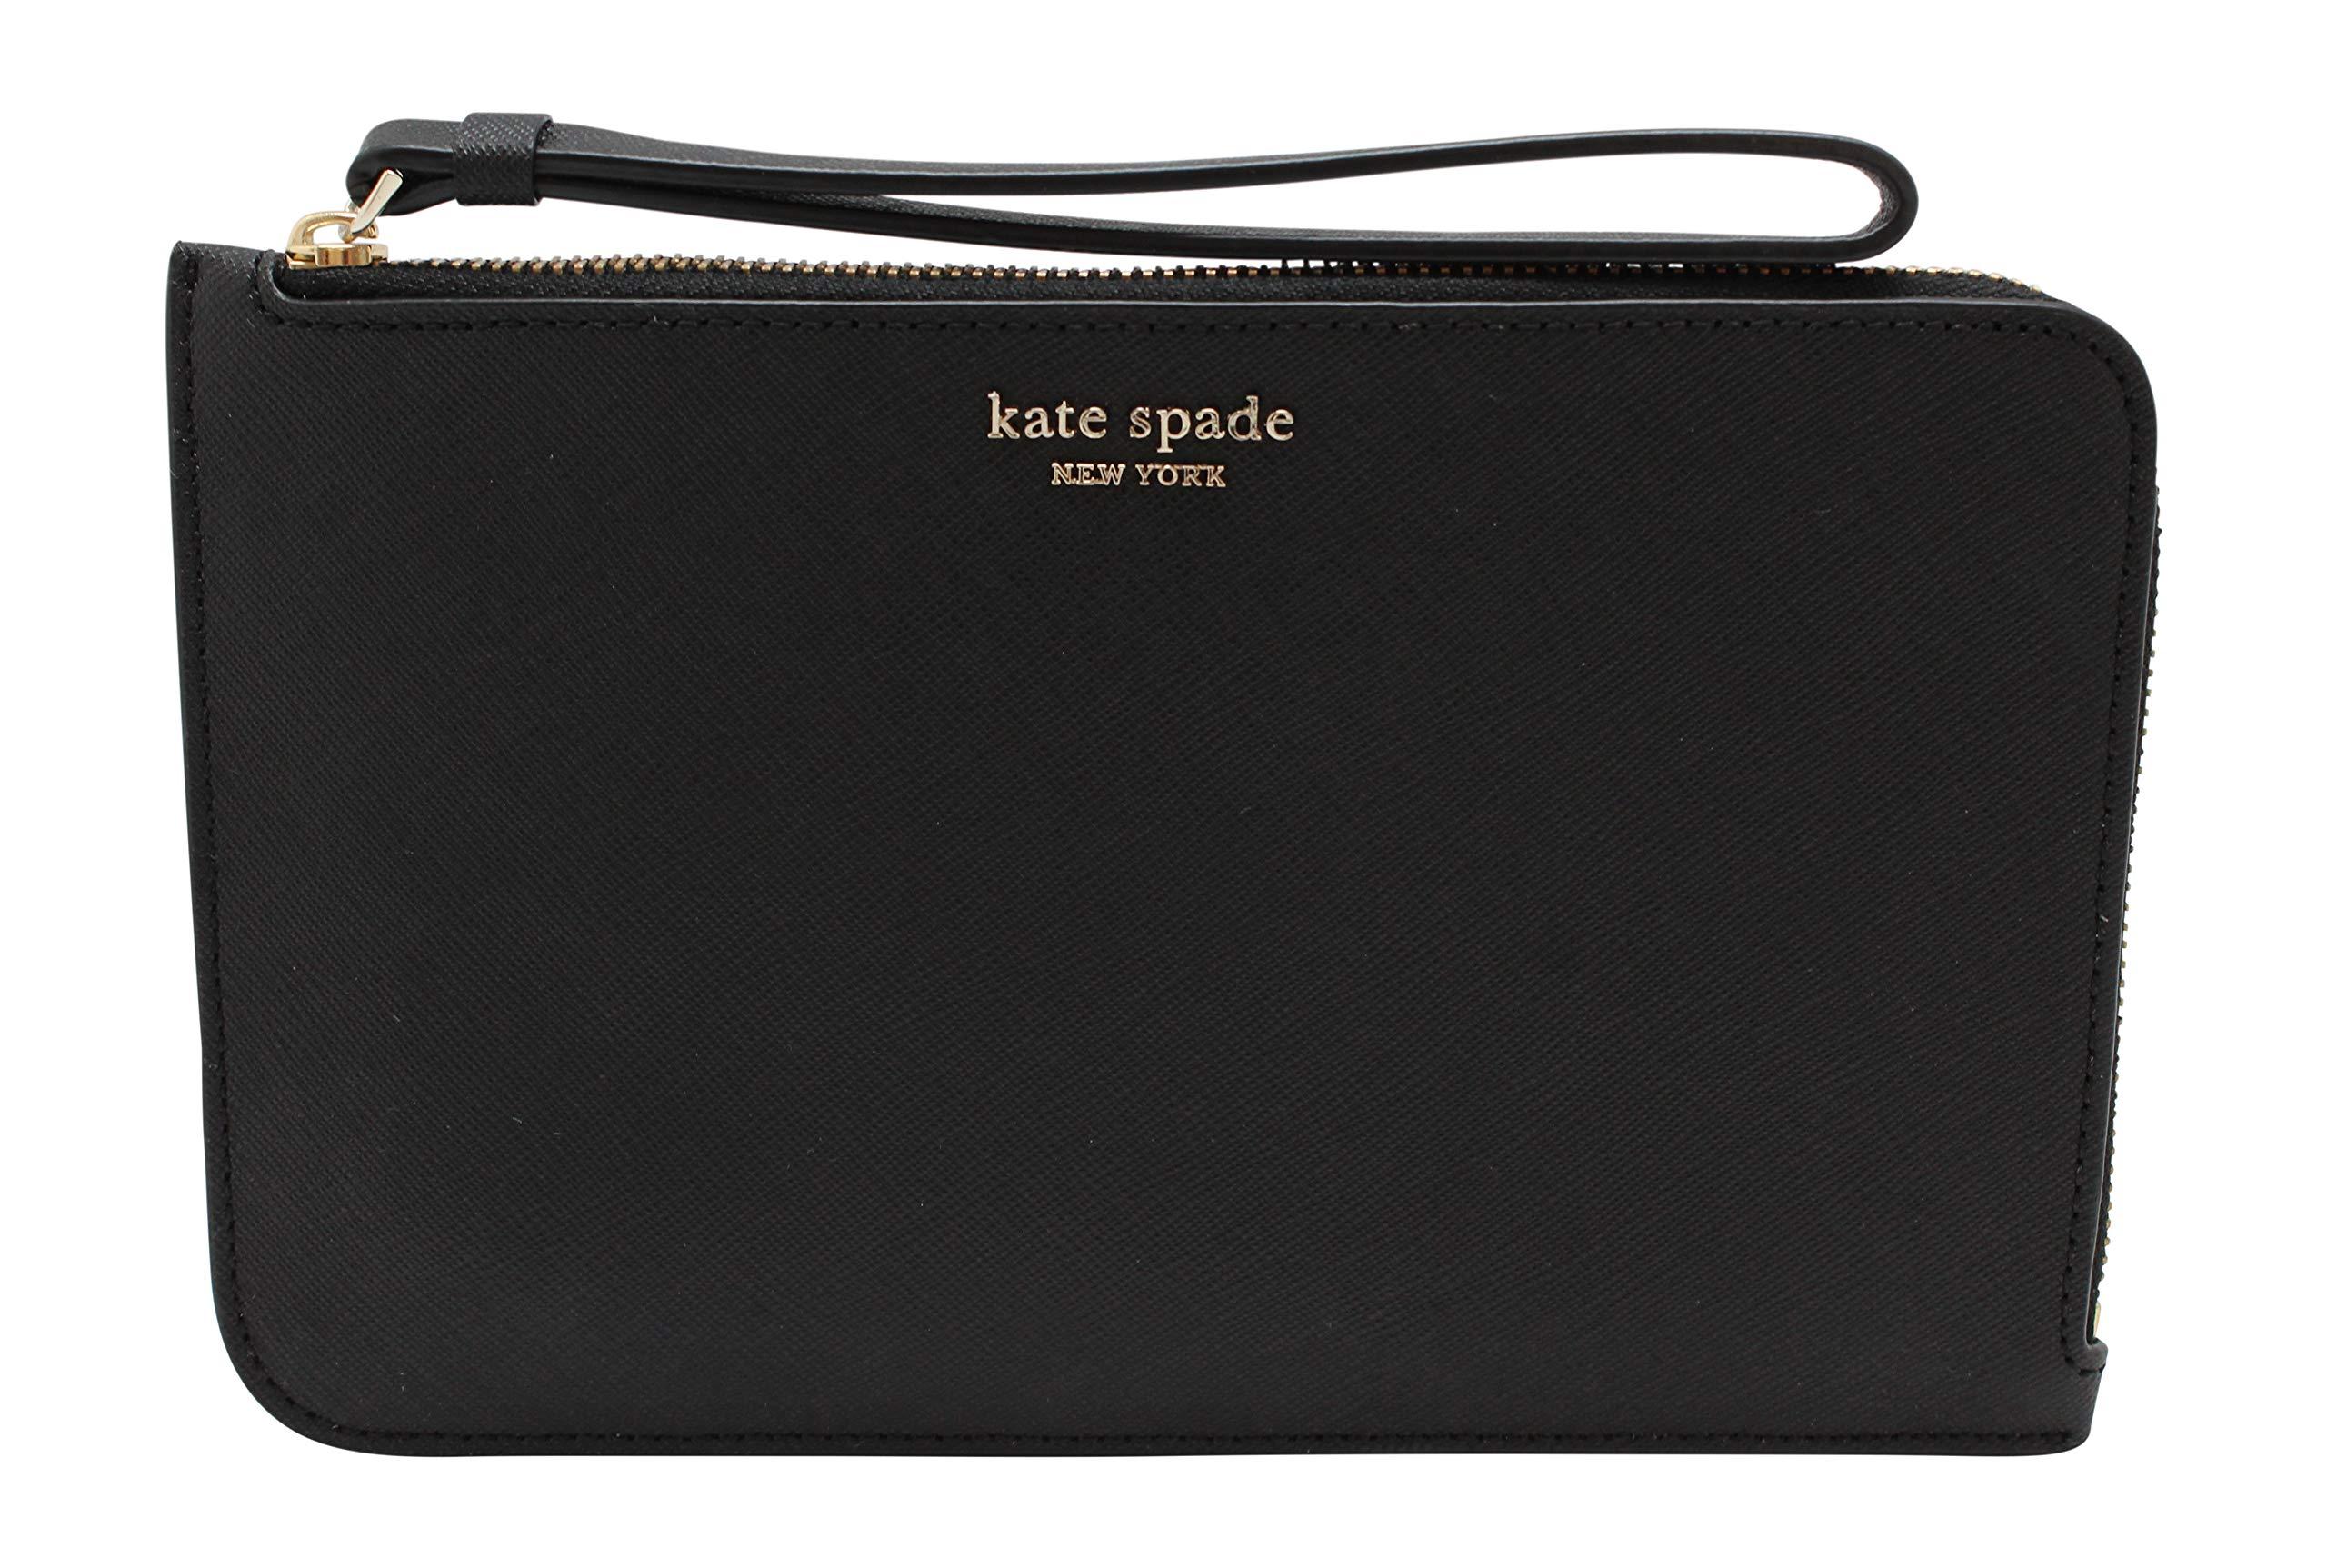 Kate Spade New York Cameron Medium L-Zip Leather Wristlet Pouch Wallet